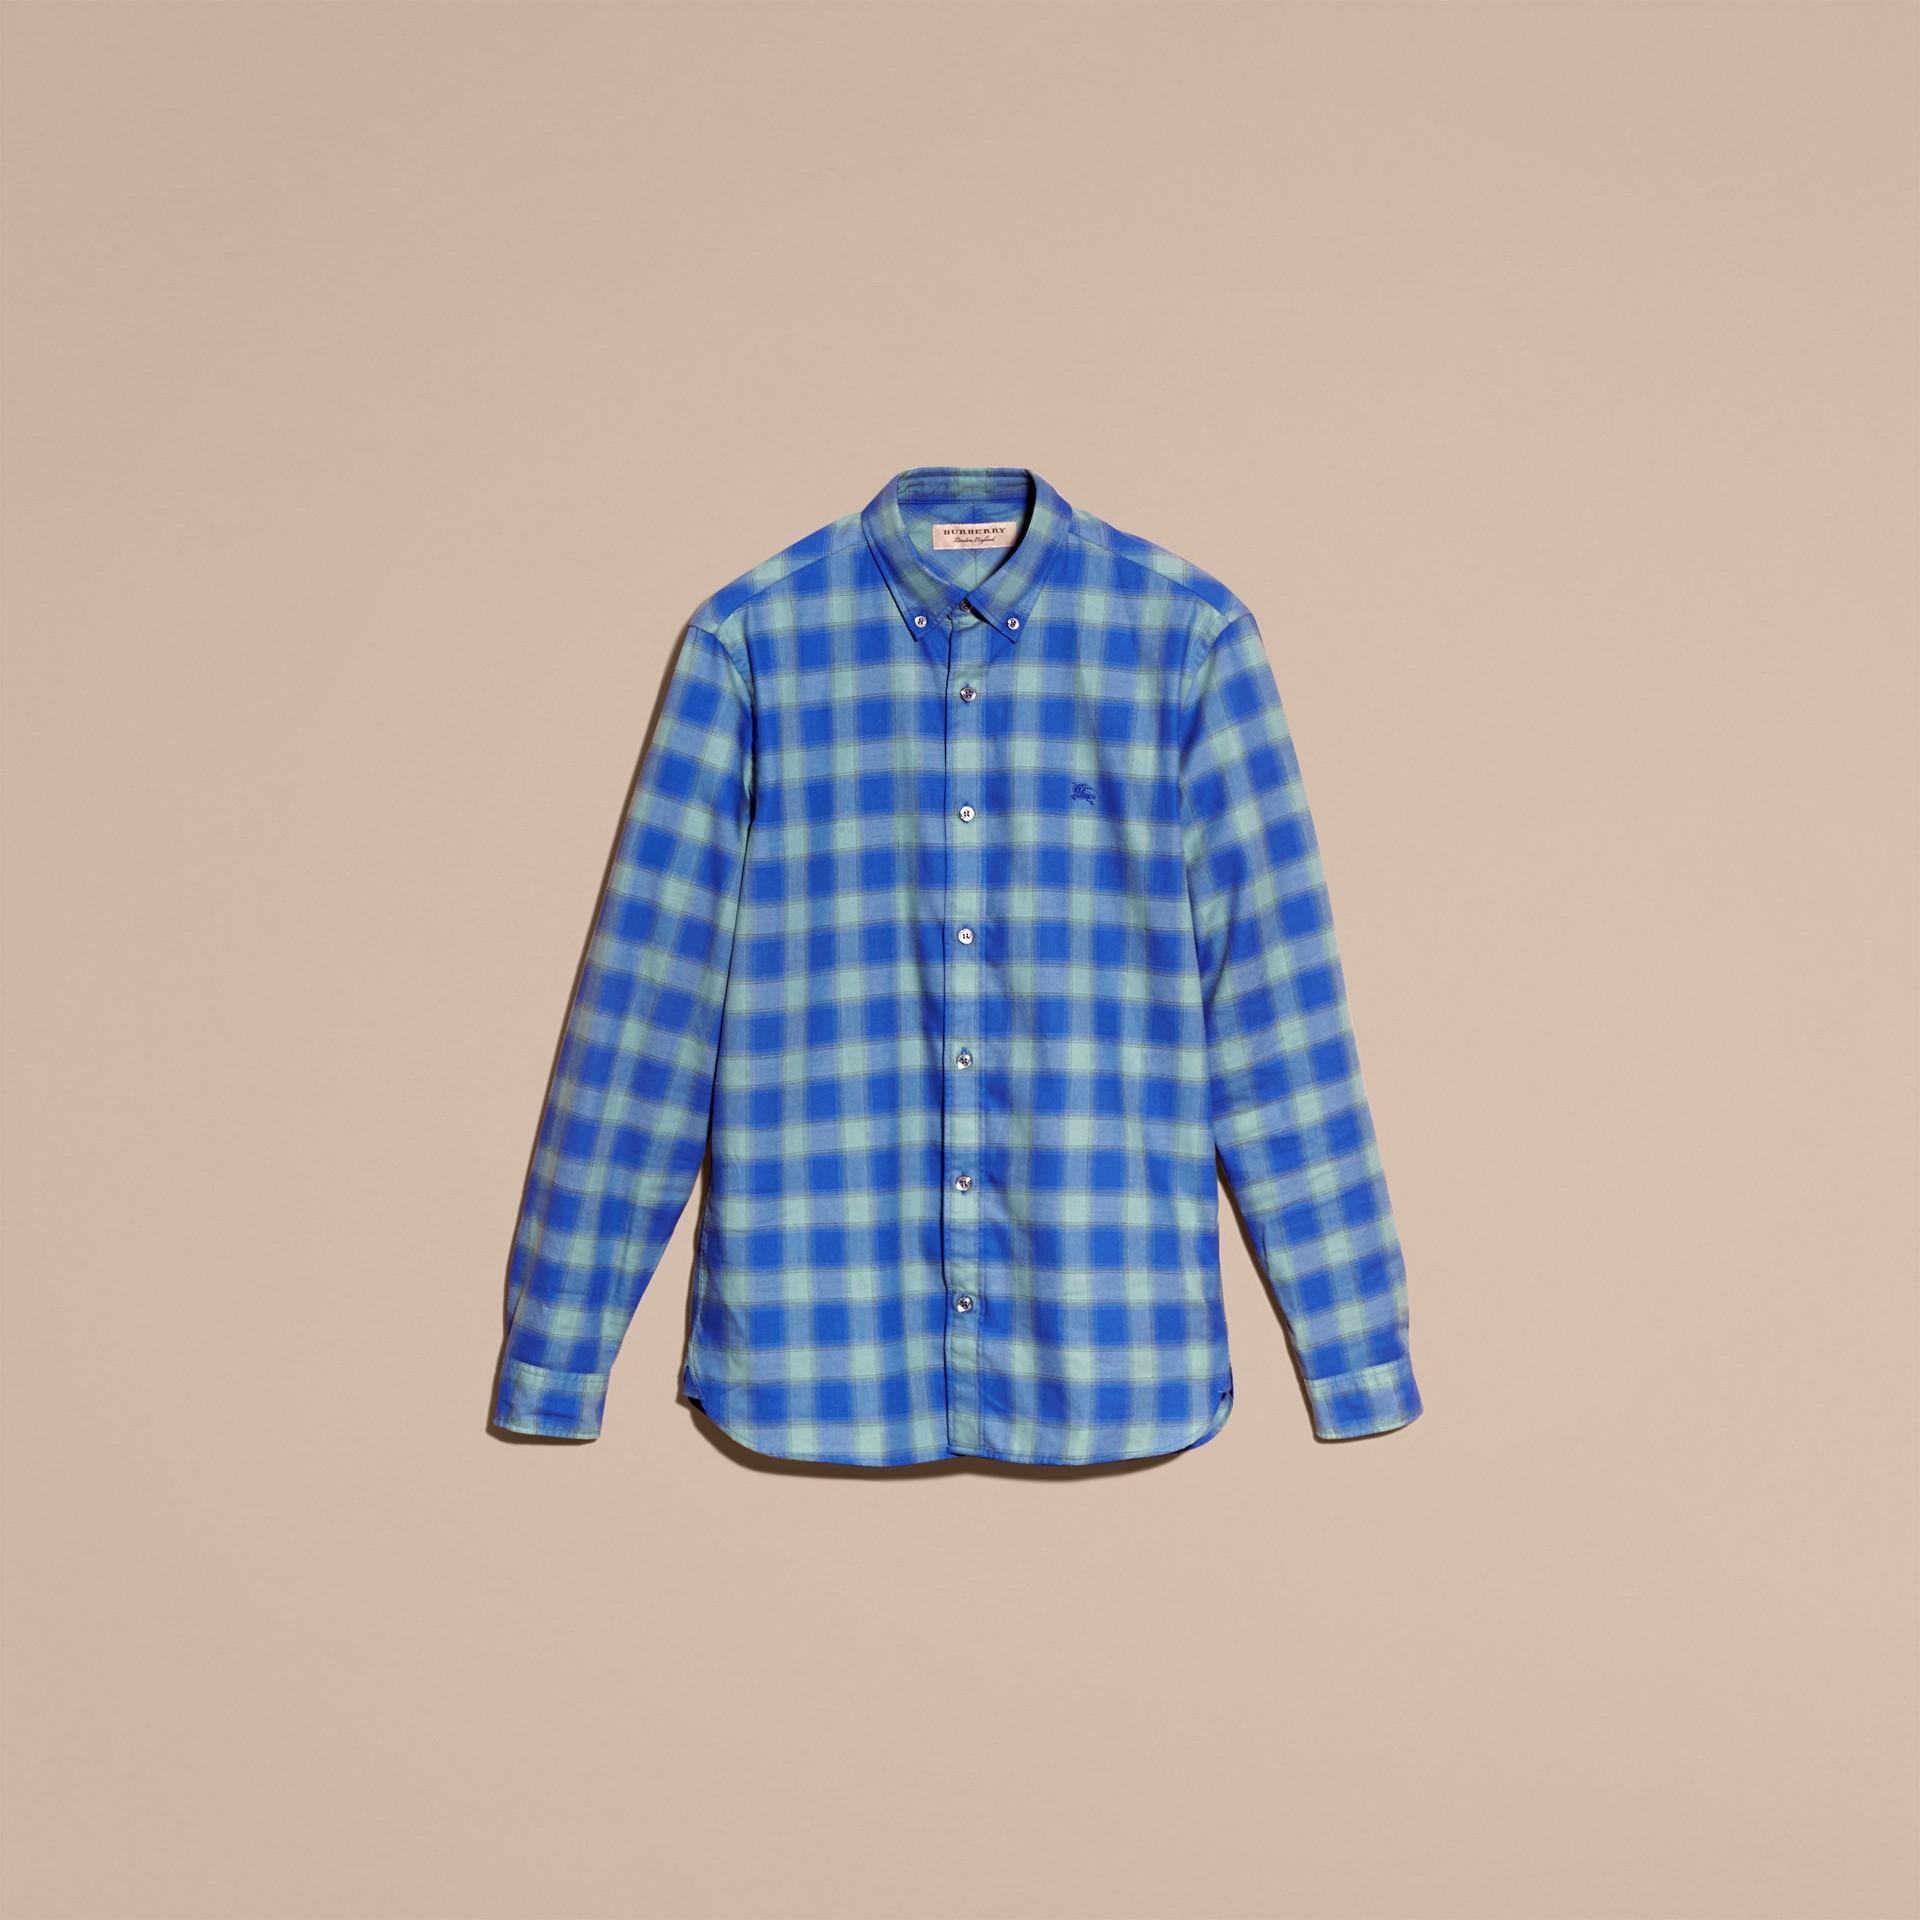 Gingham Check Cotton Shirt Eucalyptus Green - gallery image 4